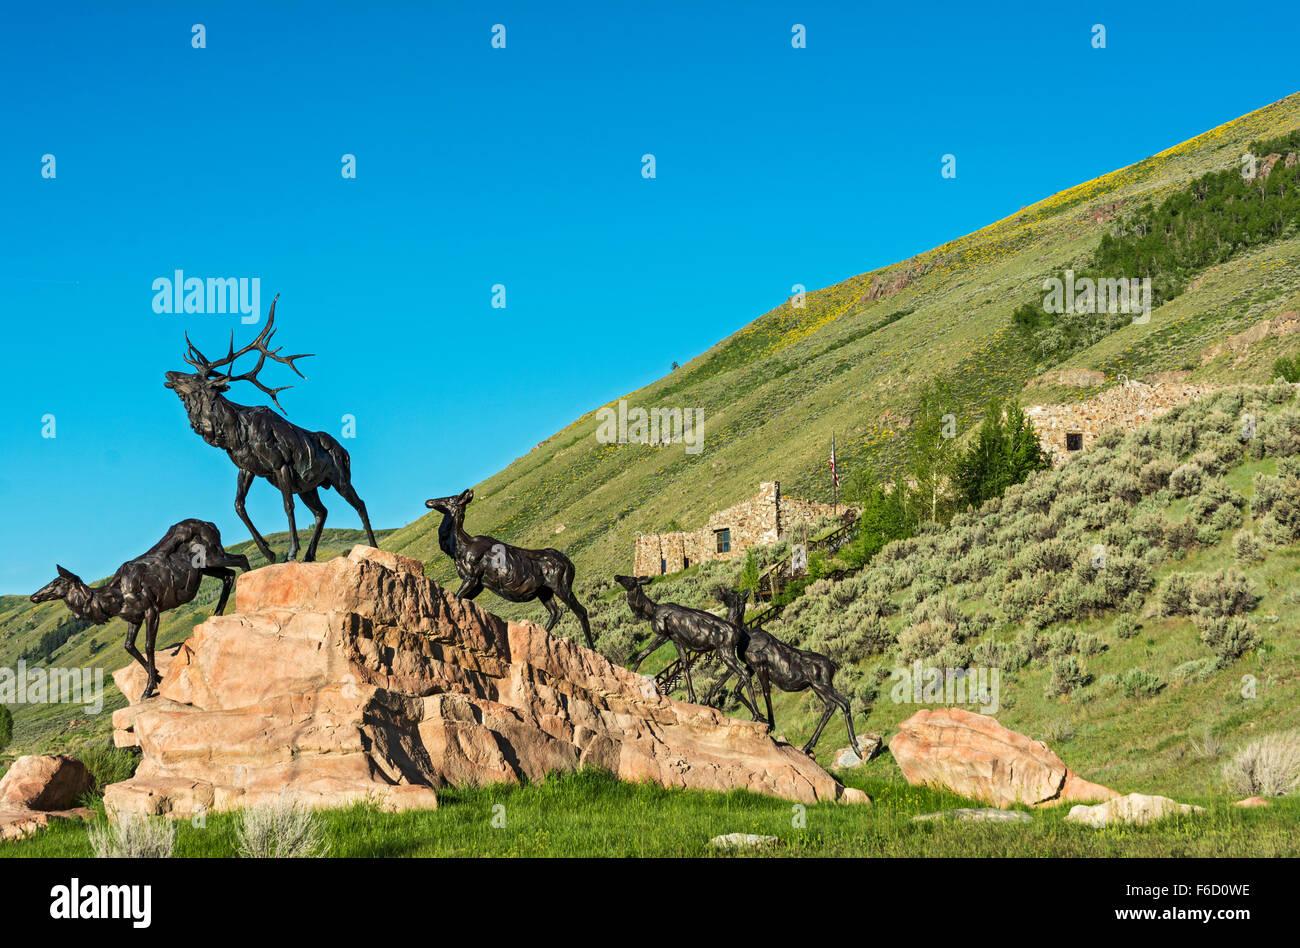 Wyoming, Jackson, National Museum of Wildlife Art, 'Wapiti Trail'  elk sculpture by Bart Walter - Stock Image